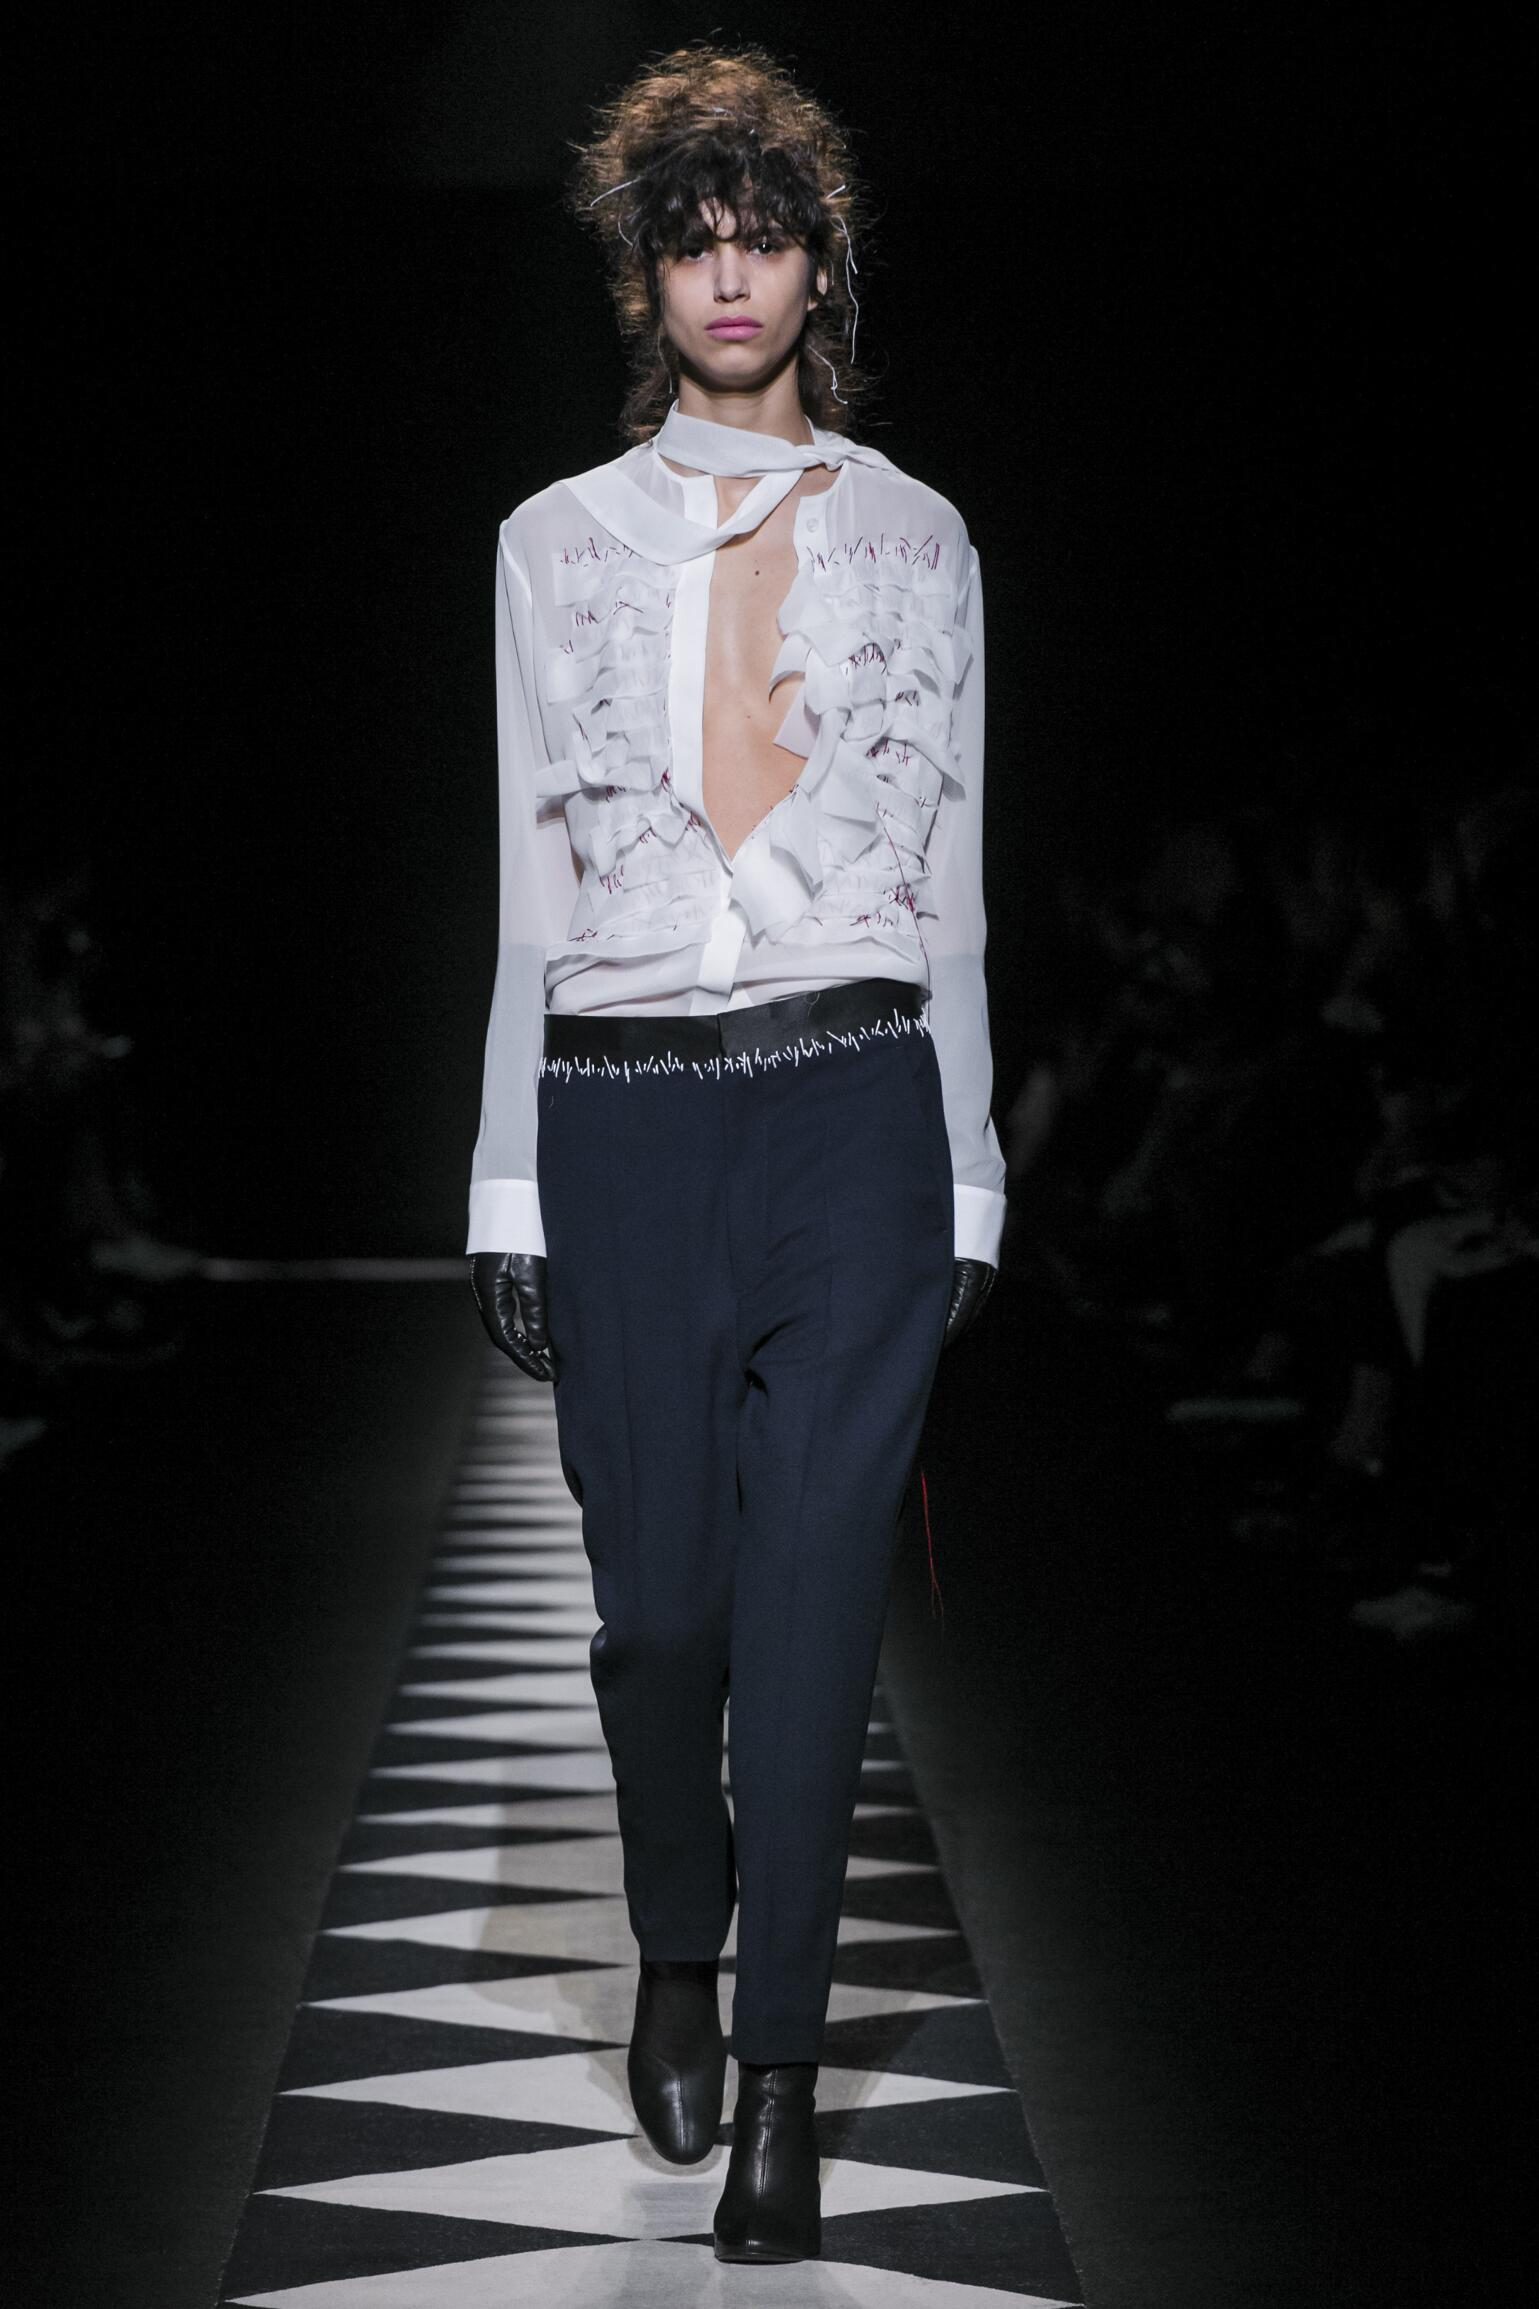 2015 Fashion Woman Model Haider Ackermann Collection Catwalk